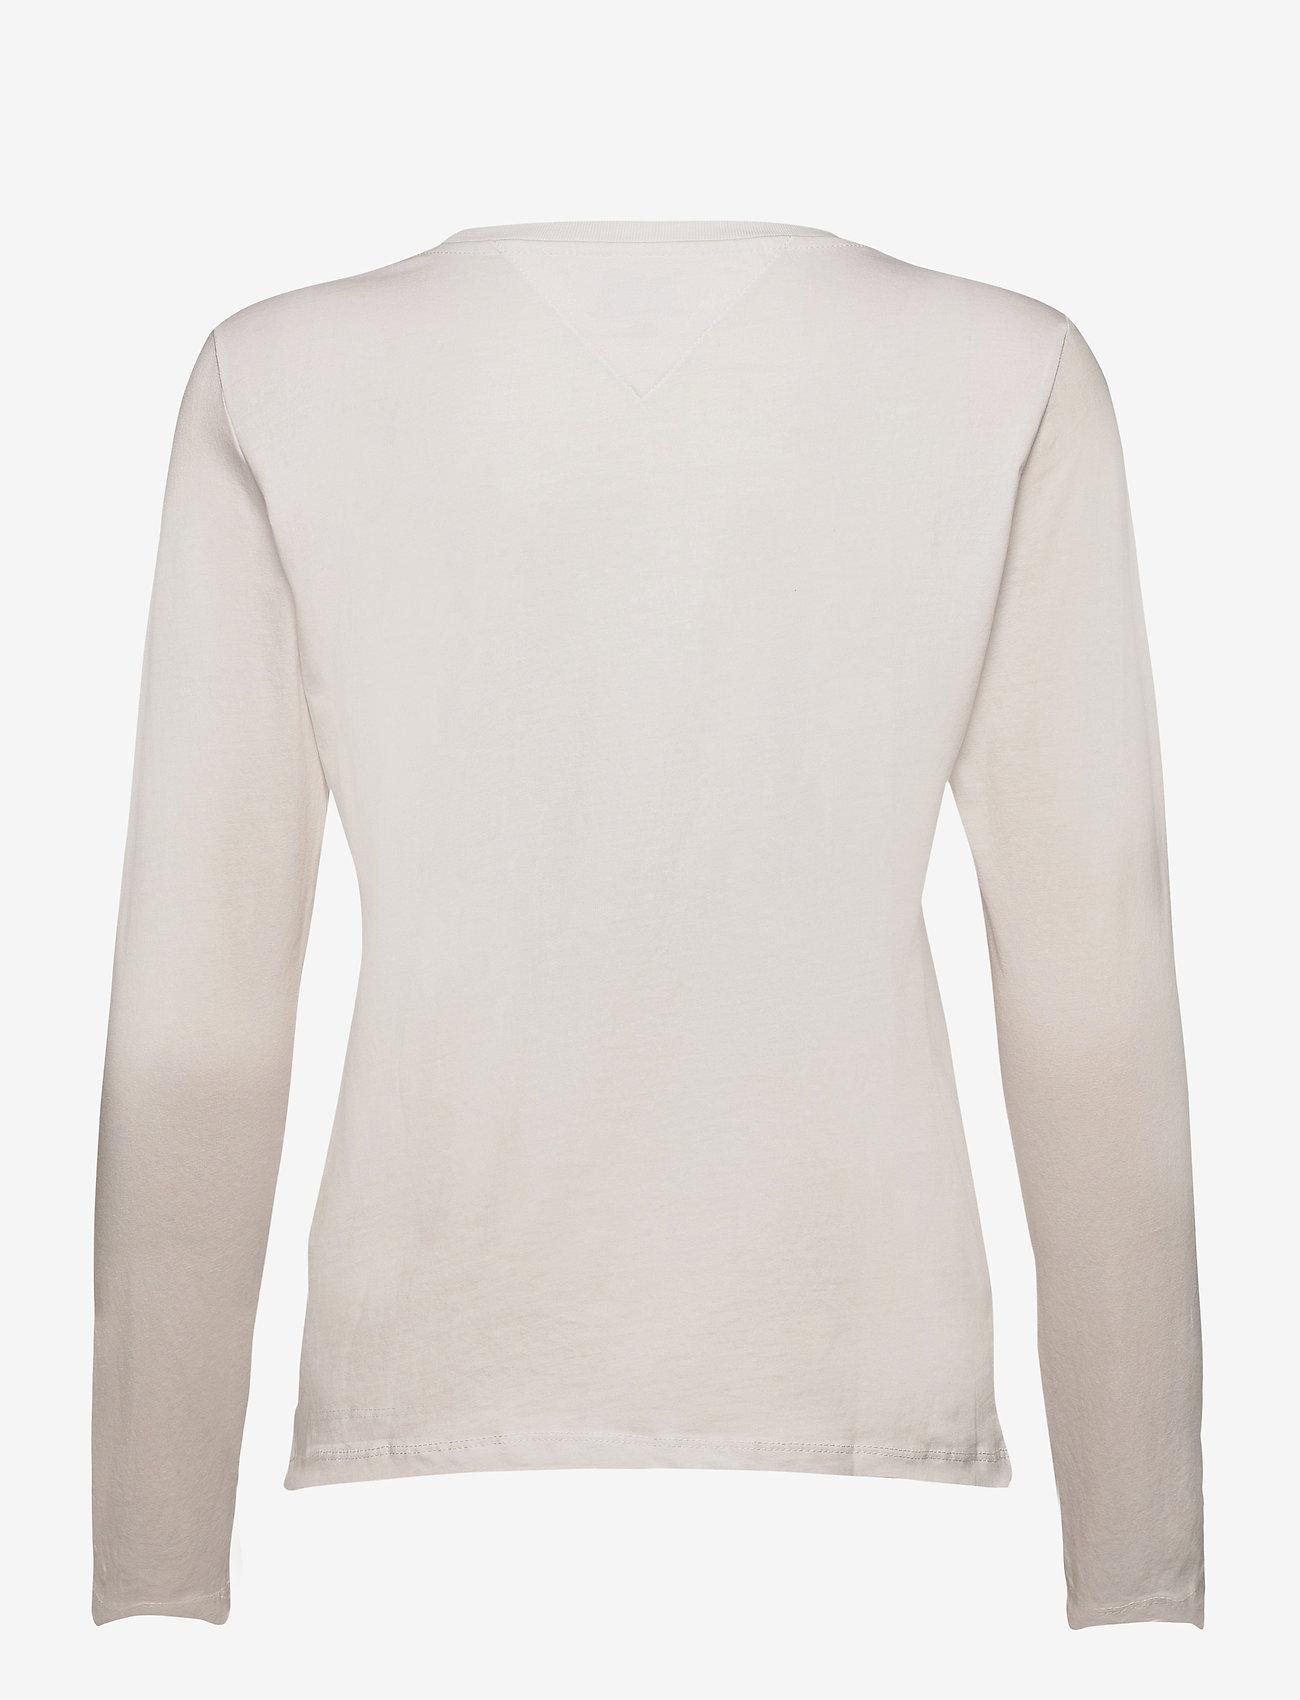 Tommy Jeans - TJW ESSENTIAL LOGO LONGSLEEVE - långärmade toppar - white - 1